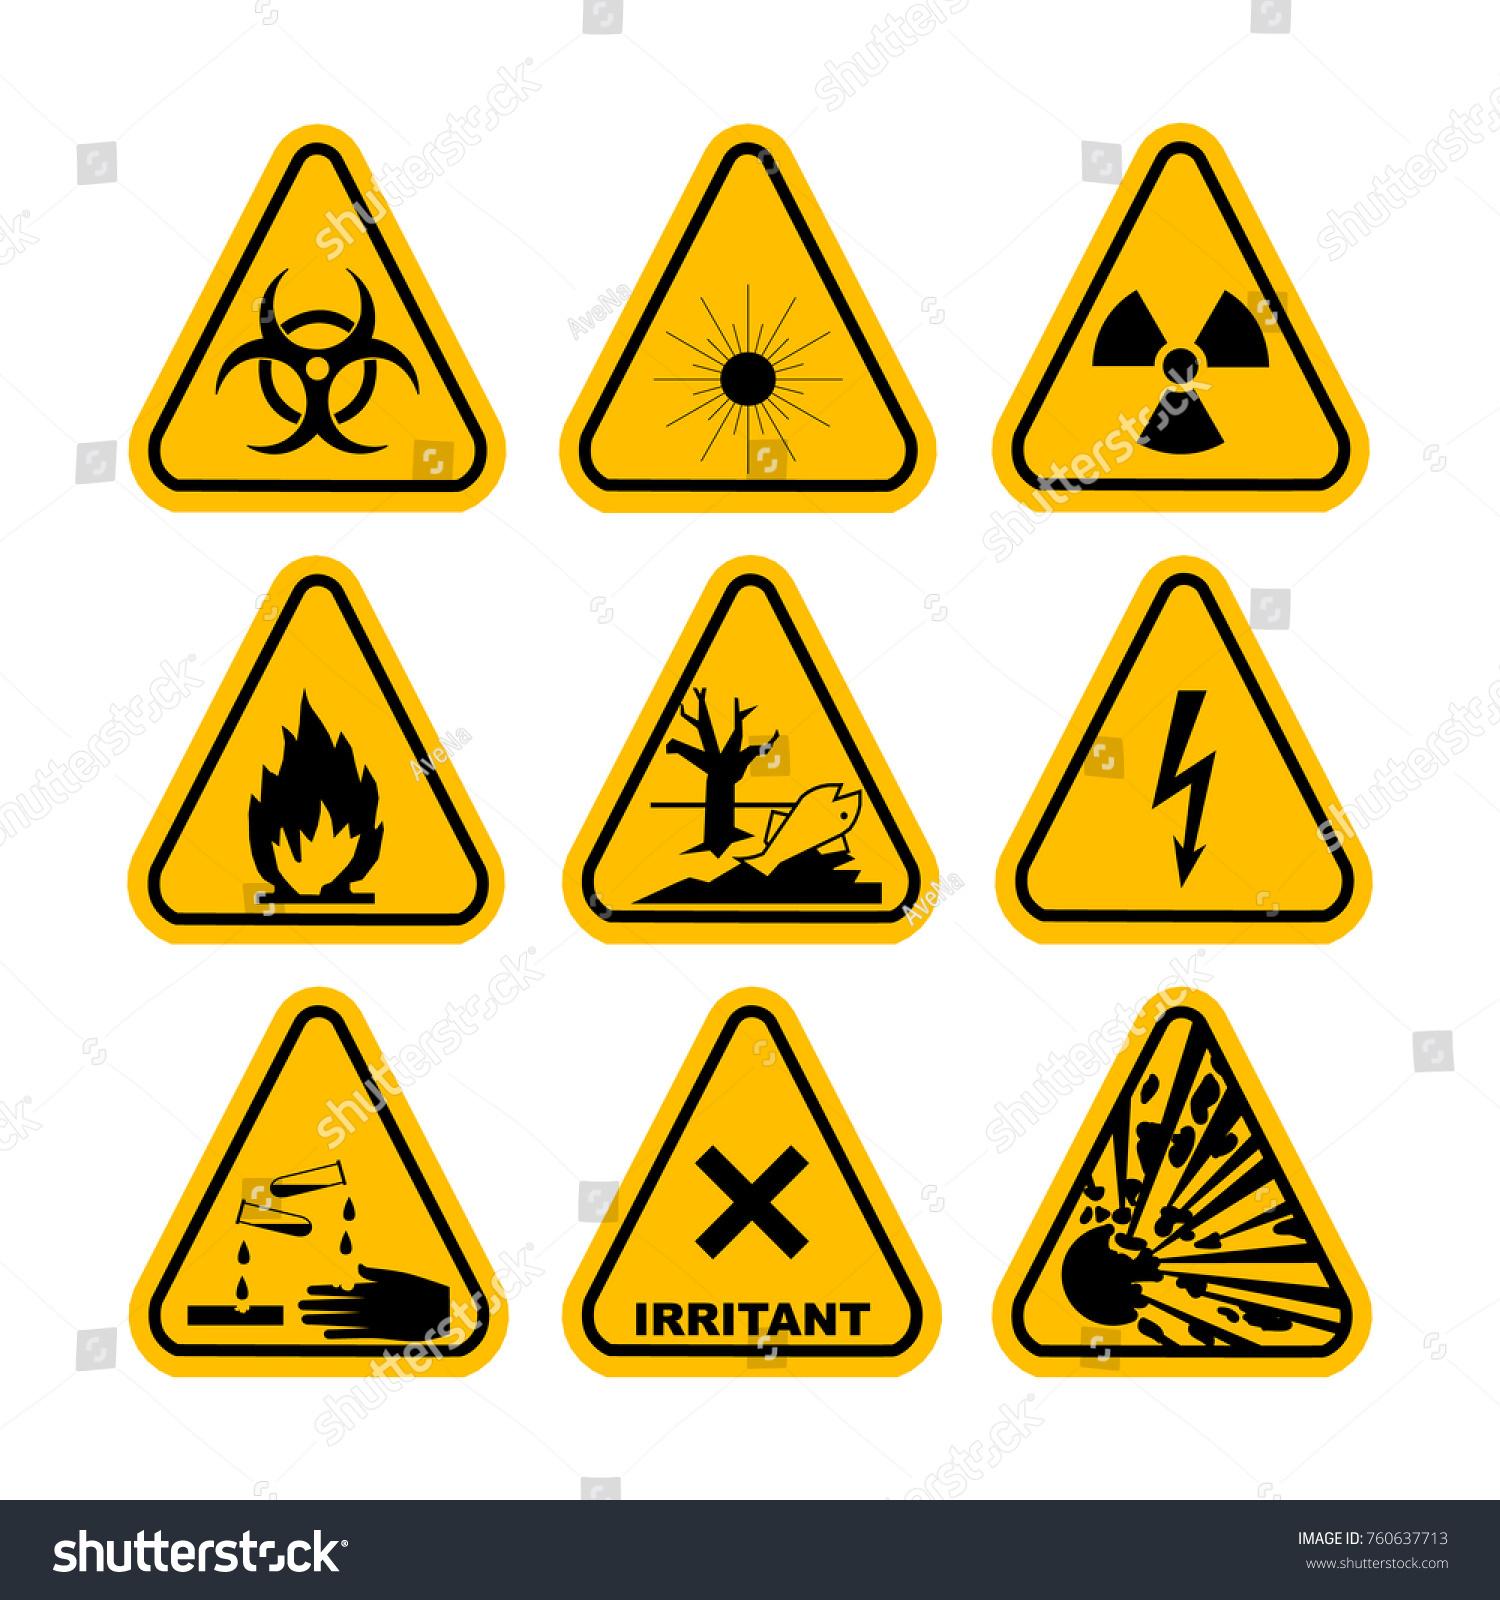 Warning Hazard Symbols Set Icons High Stock Illustration 760637713